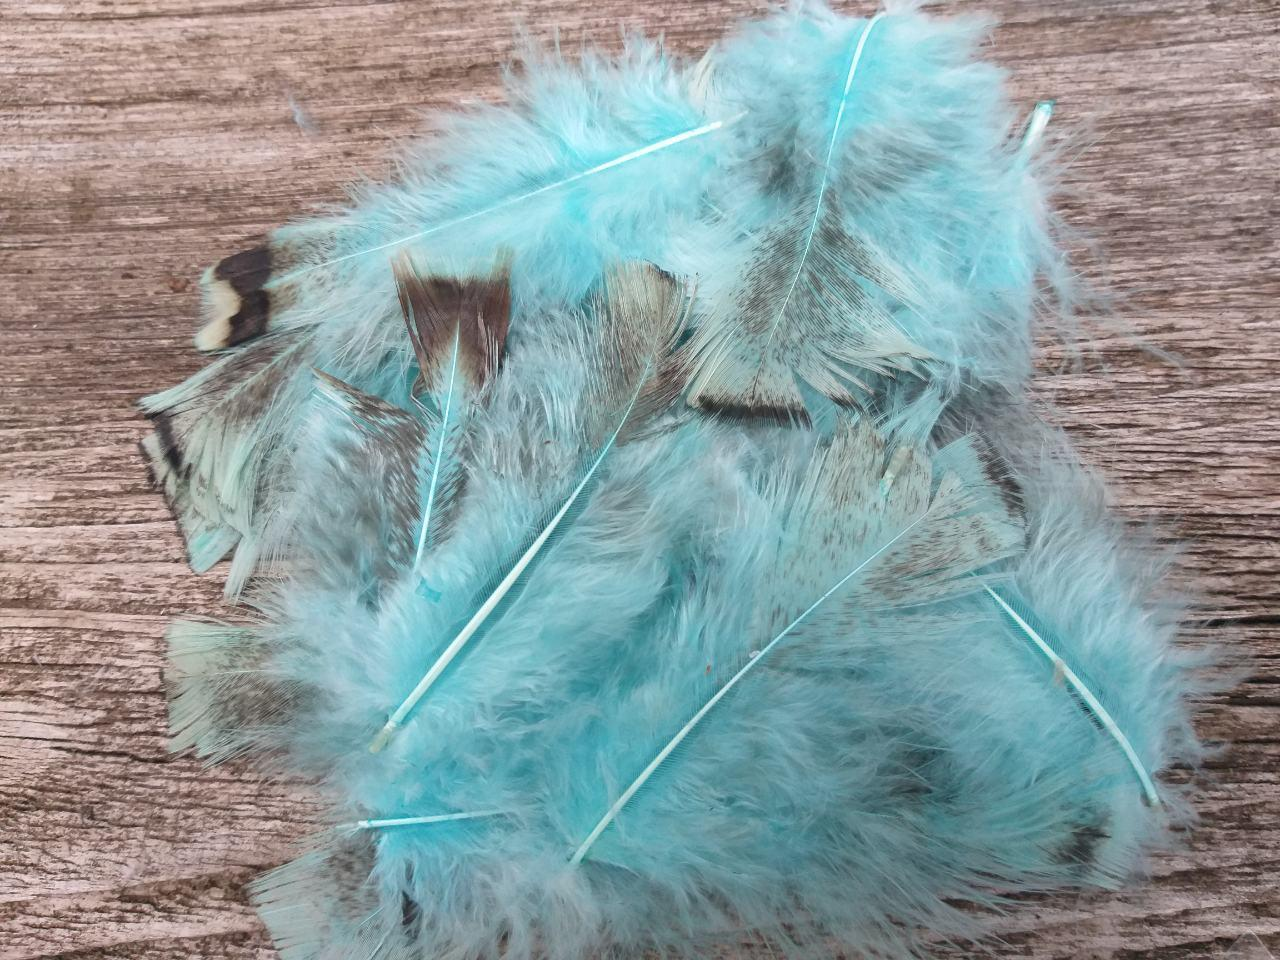 Маленьке пухкеньке пір'ячко голубого кольору, 10 шт. в упаковці, довжина пера 8-16 см., 25 грн.